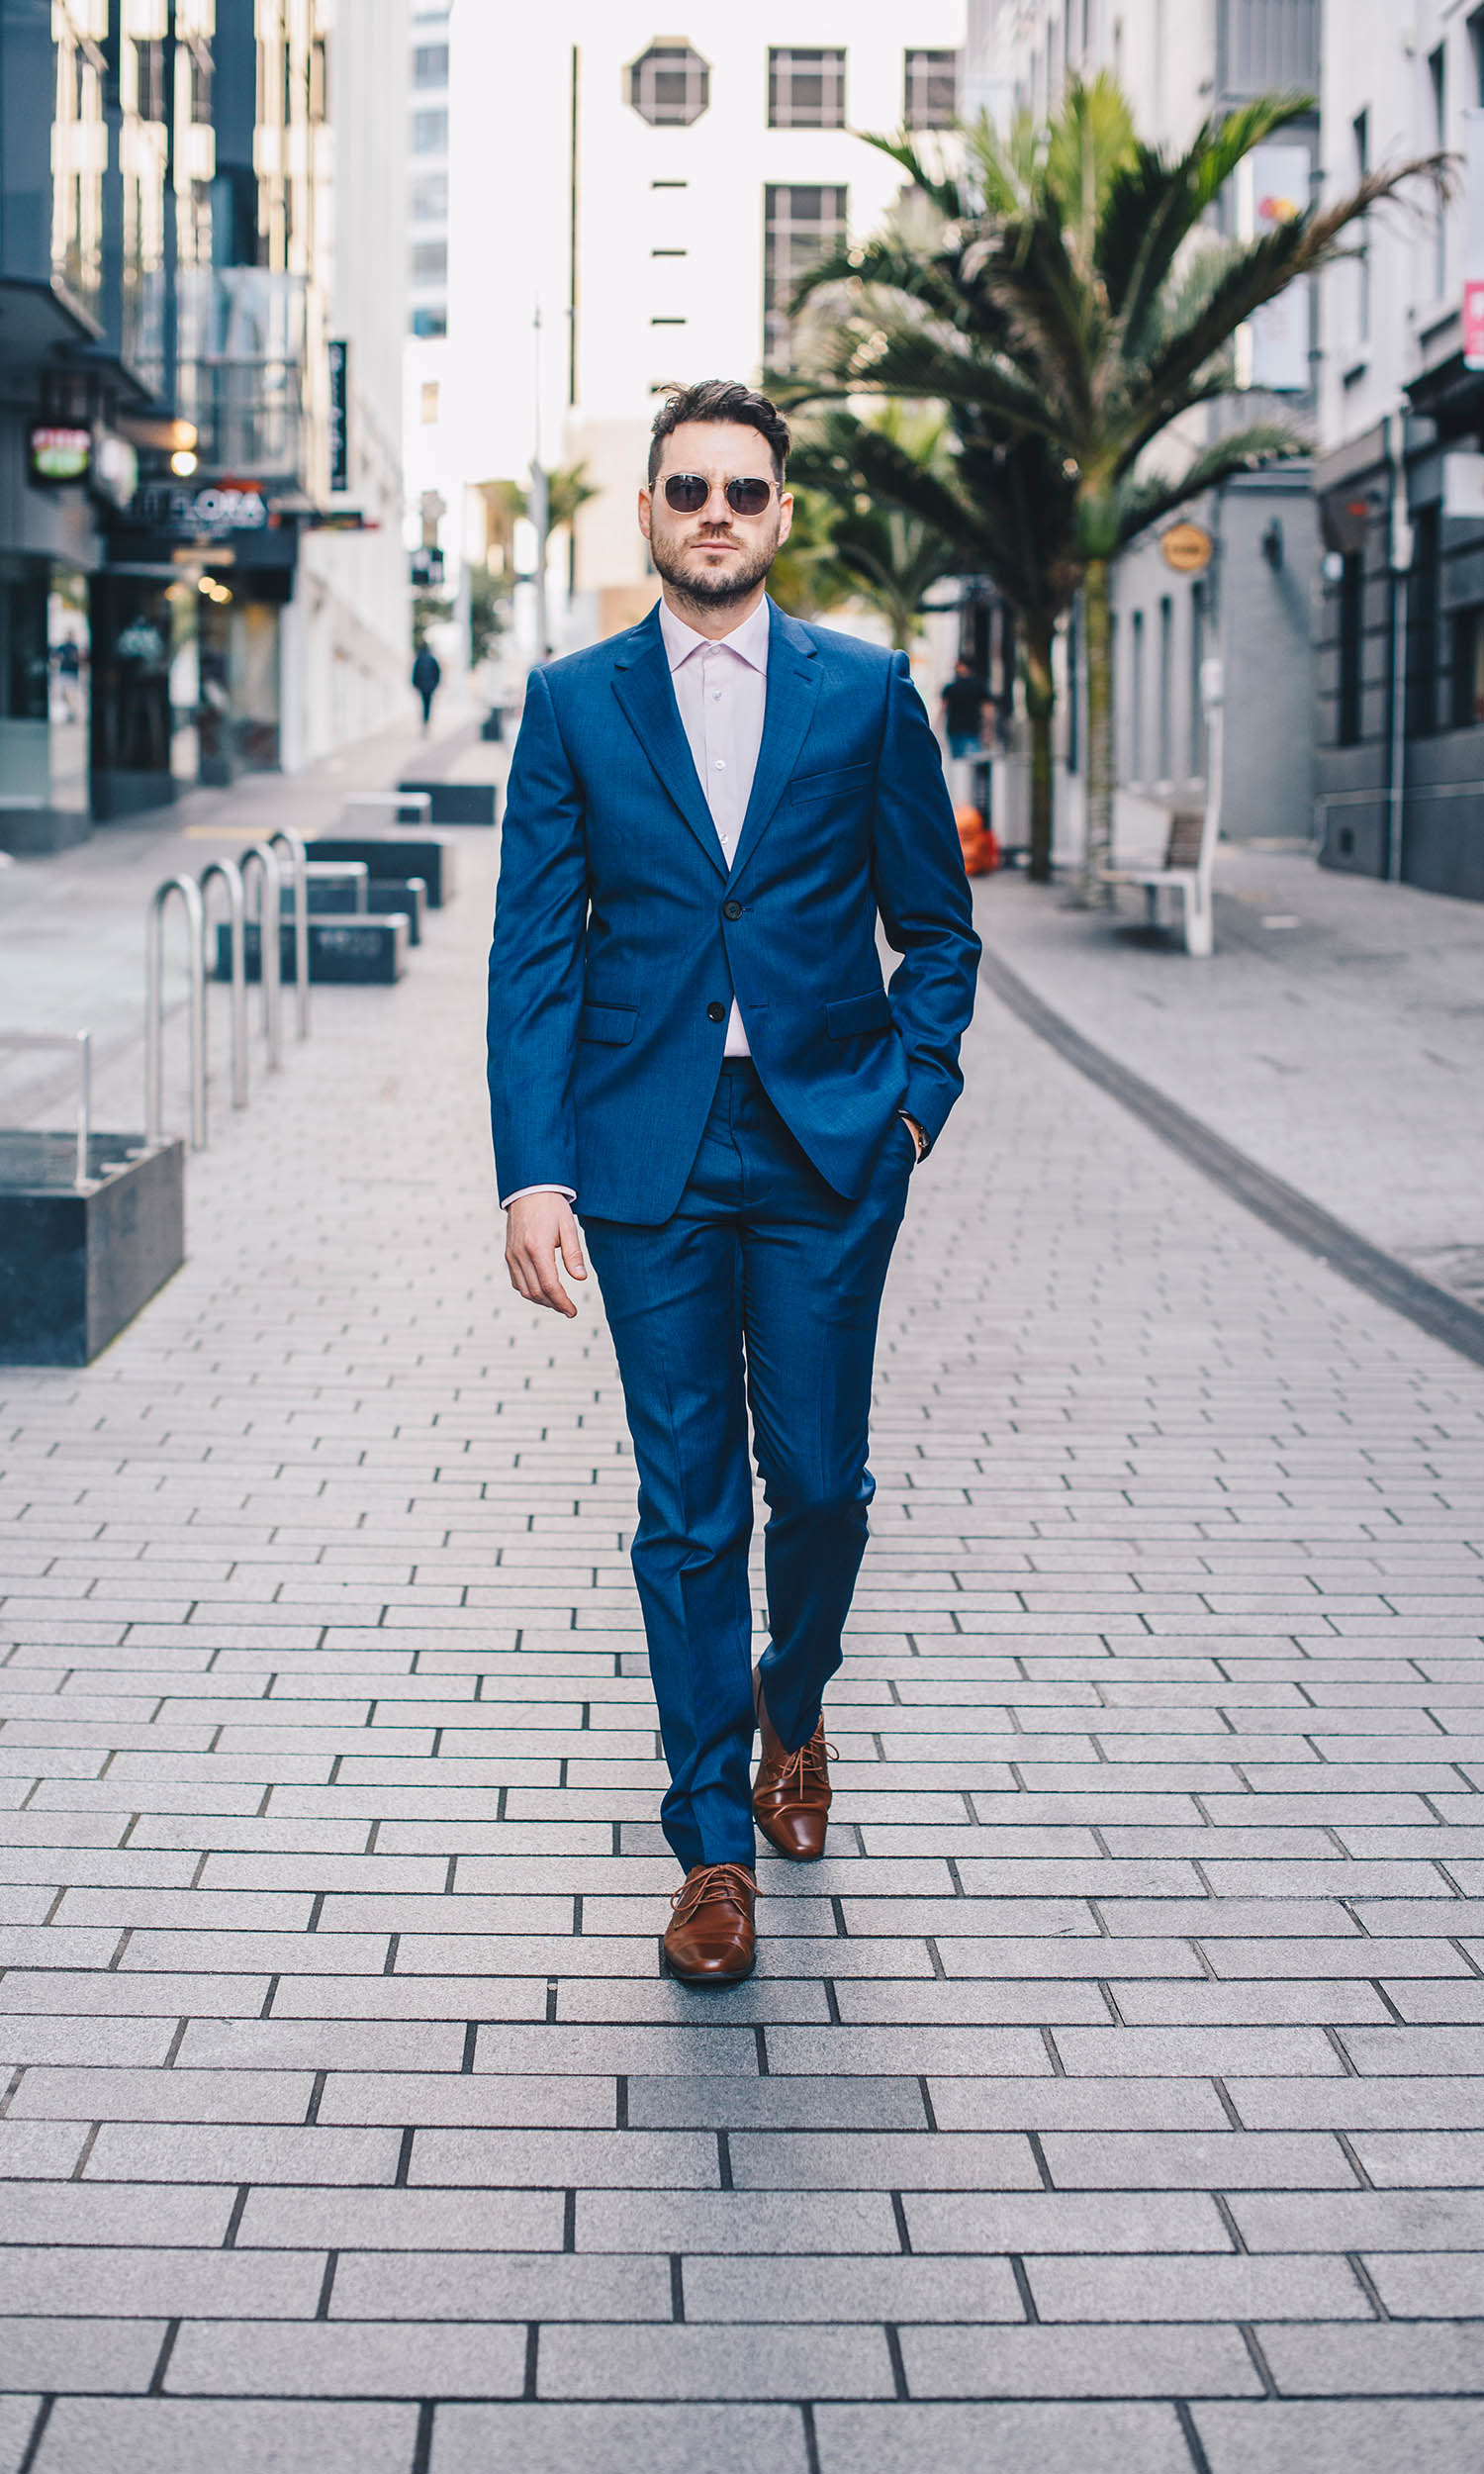 jaheb_barnett_new_zealand_fashion_blogger_farmers_calvin_klein_11.jpg